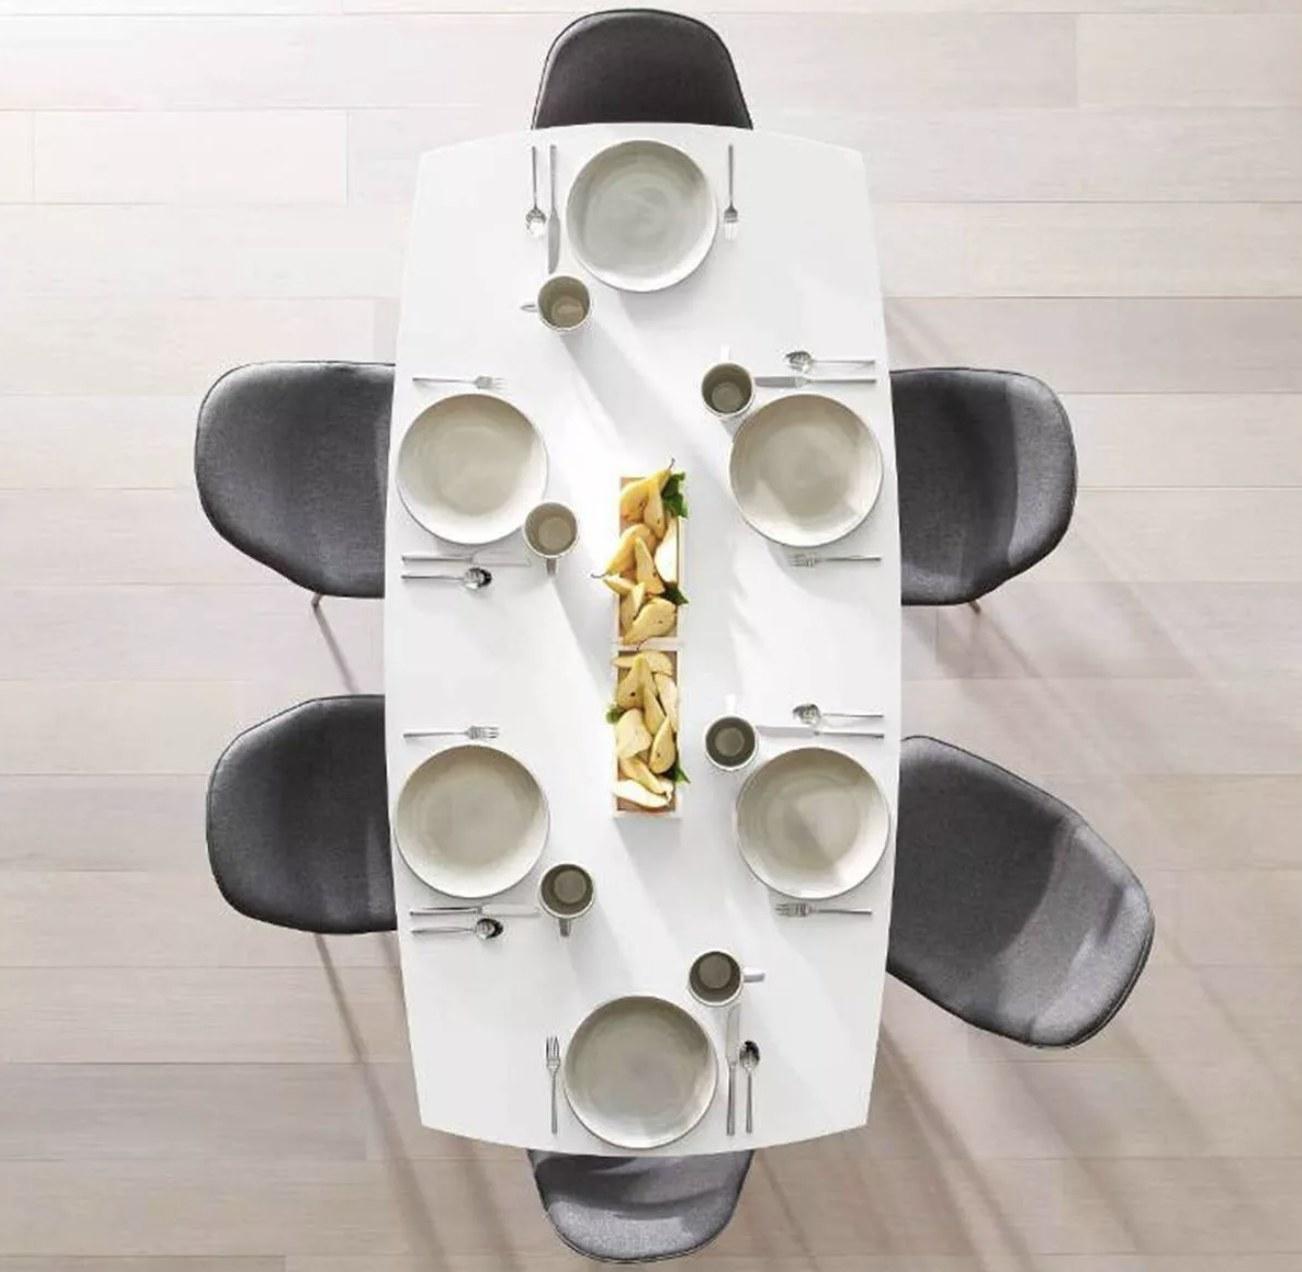 The flatware set